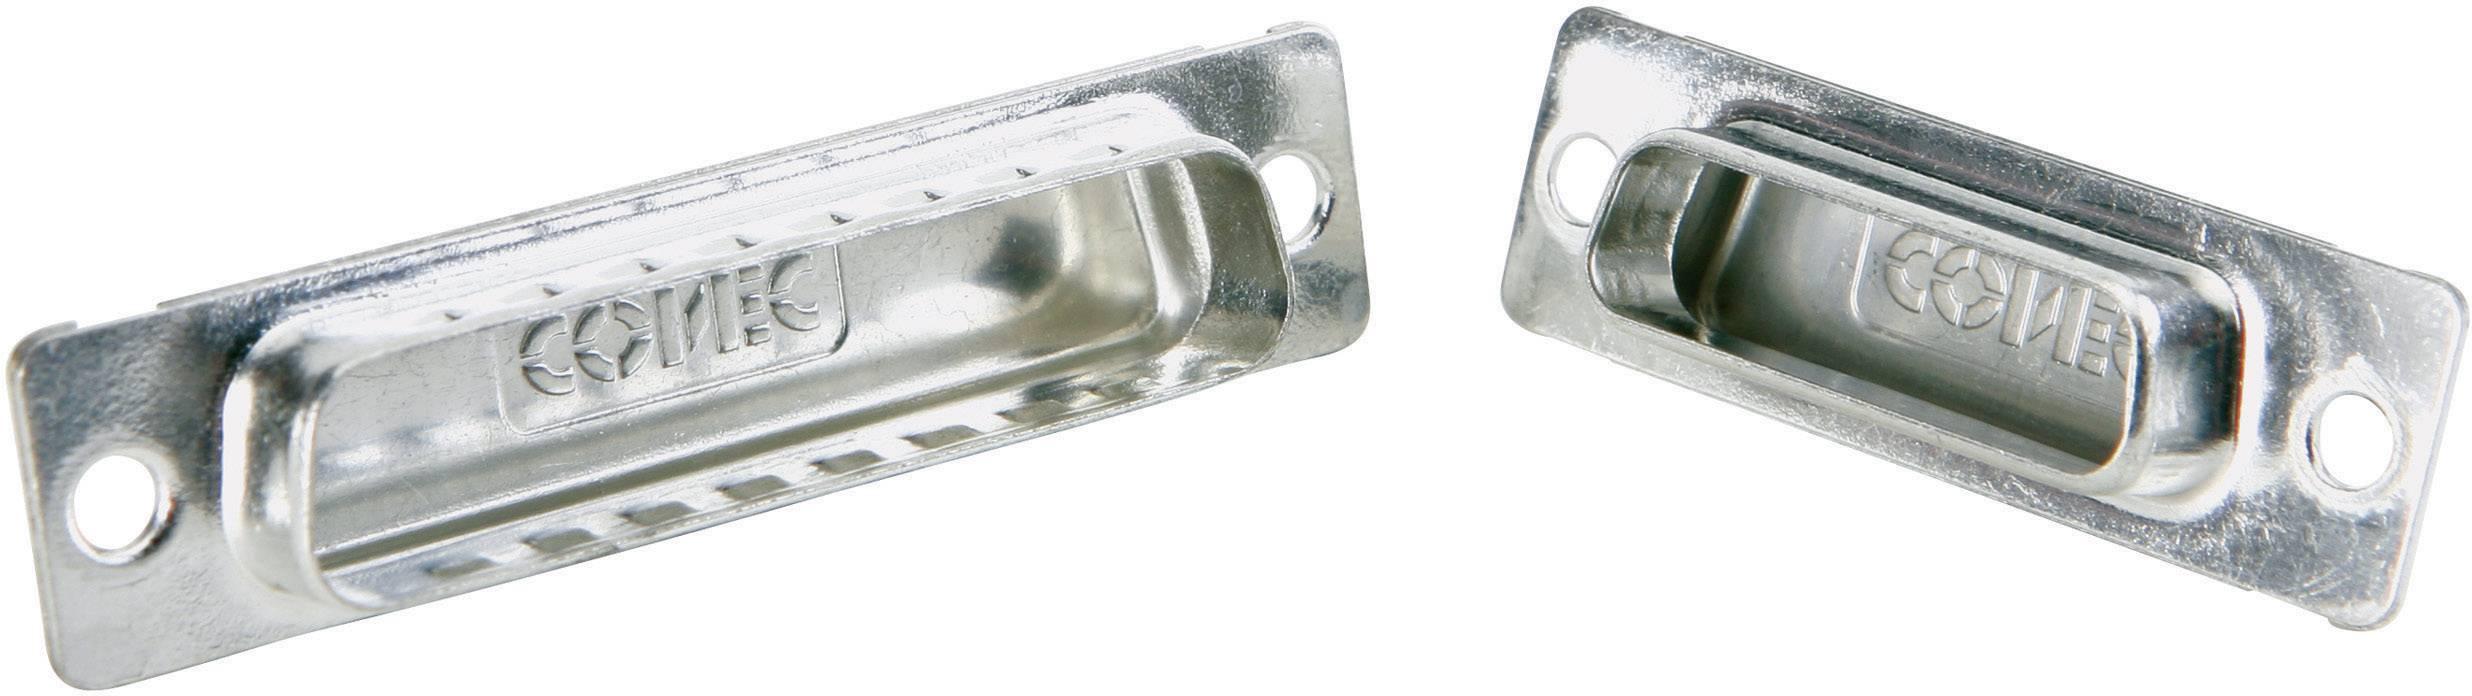 Záslepka D-SUB konektoru Conec 165X13129X, strieborná, 1 ks